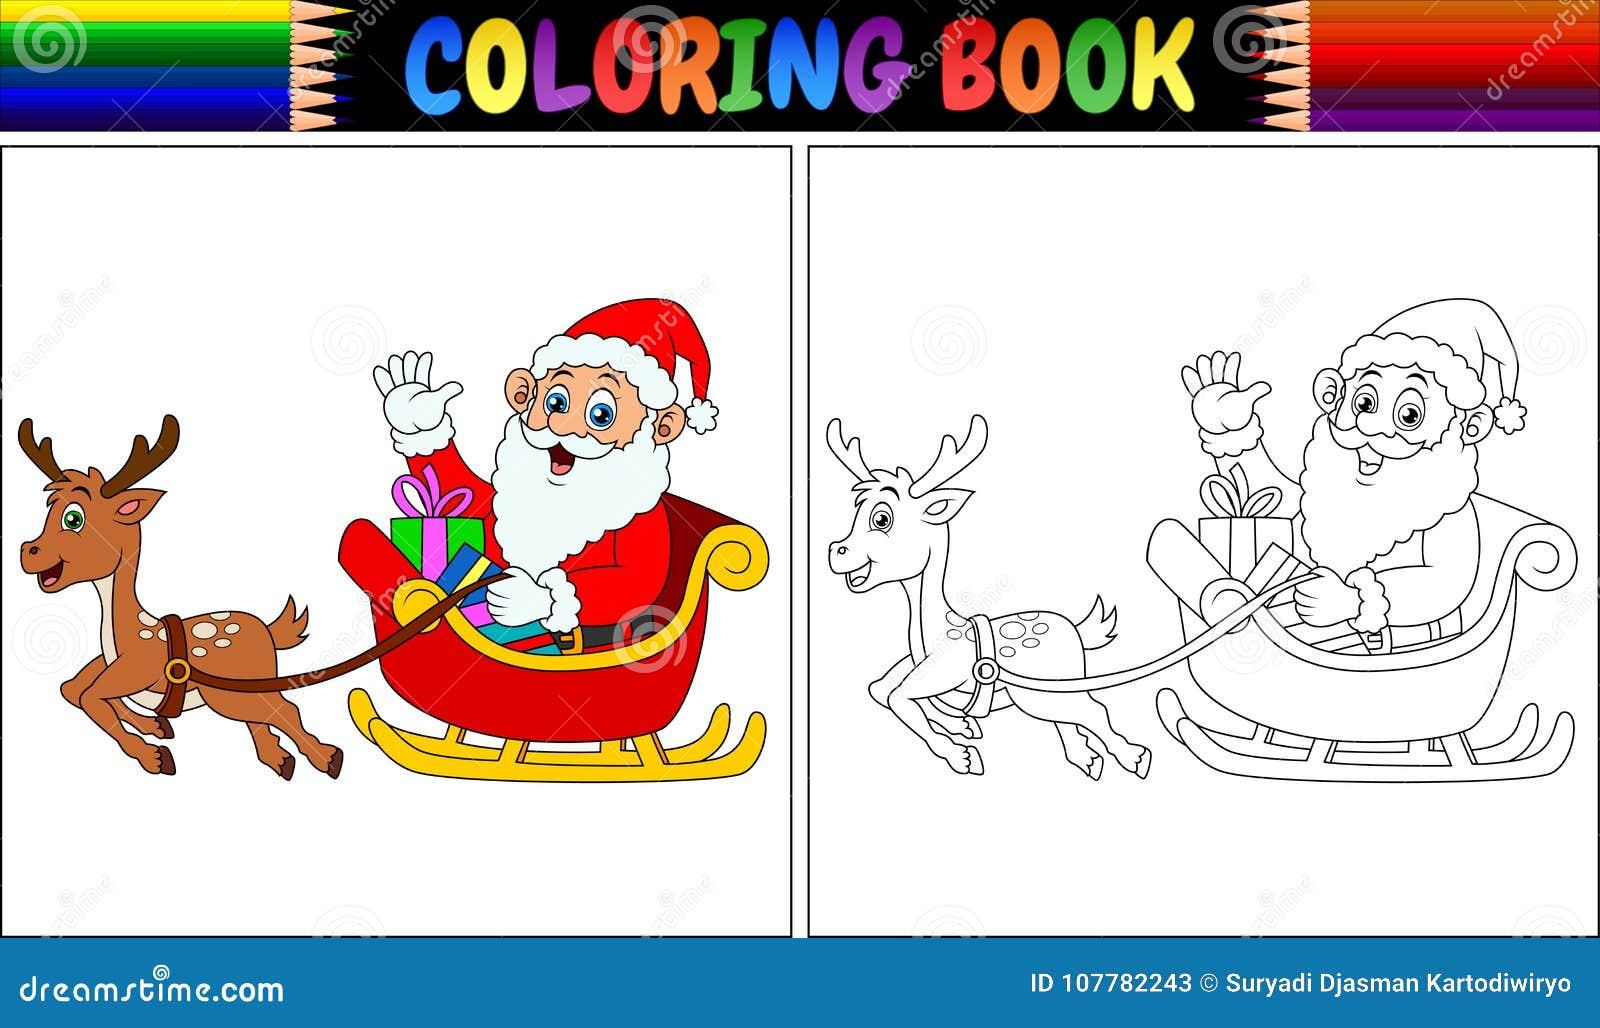 Coloring Book Cartoon Santa Claus Riding His Reindeer Sleigh Stock